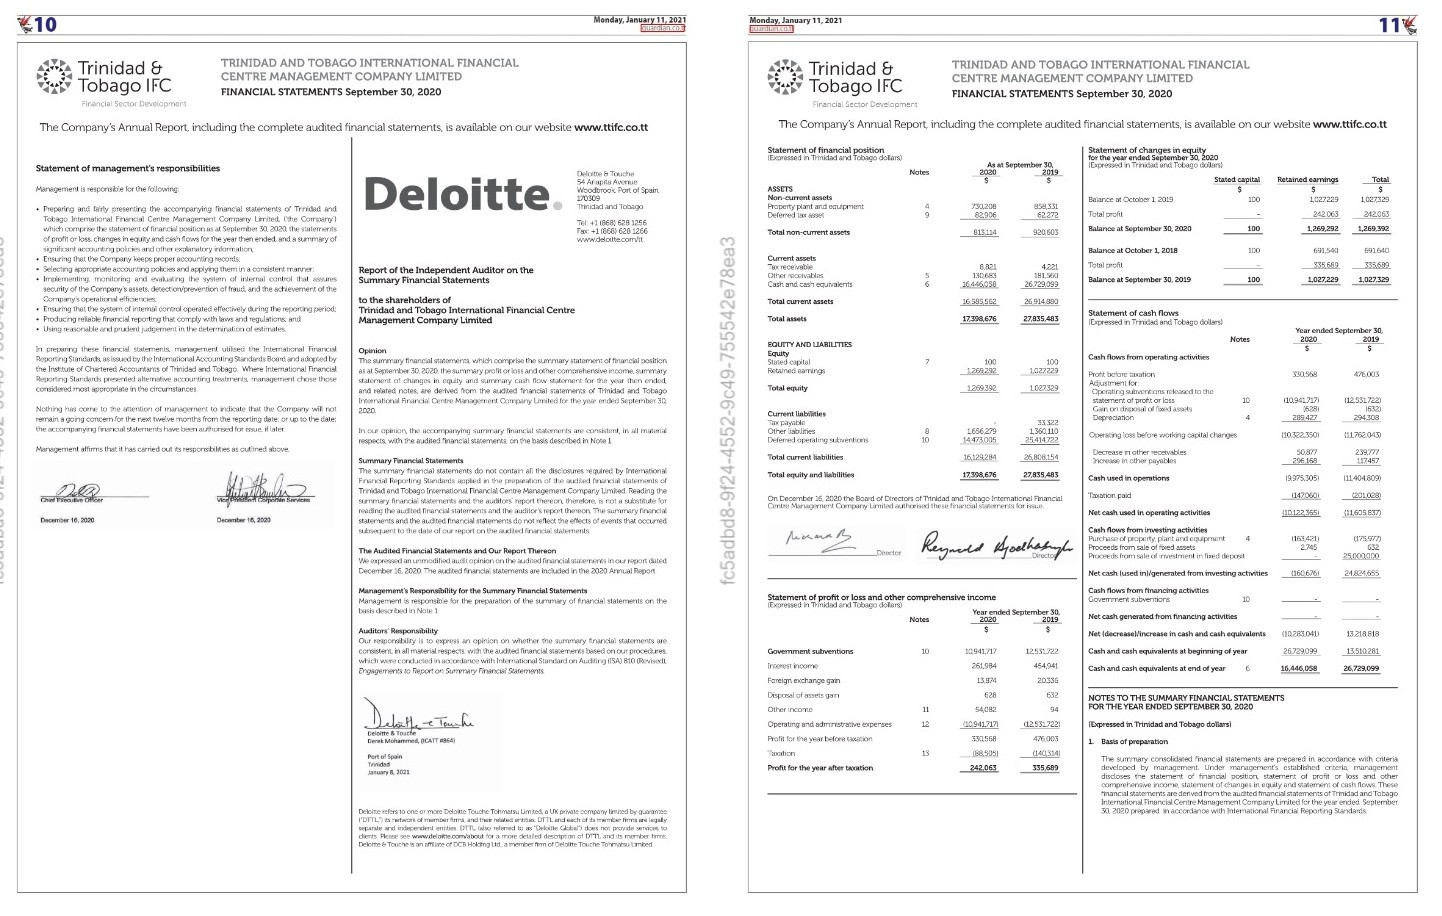 Financial Statements September 30, 2020